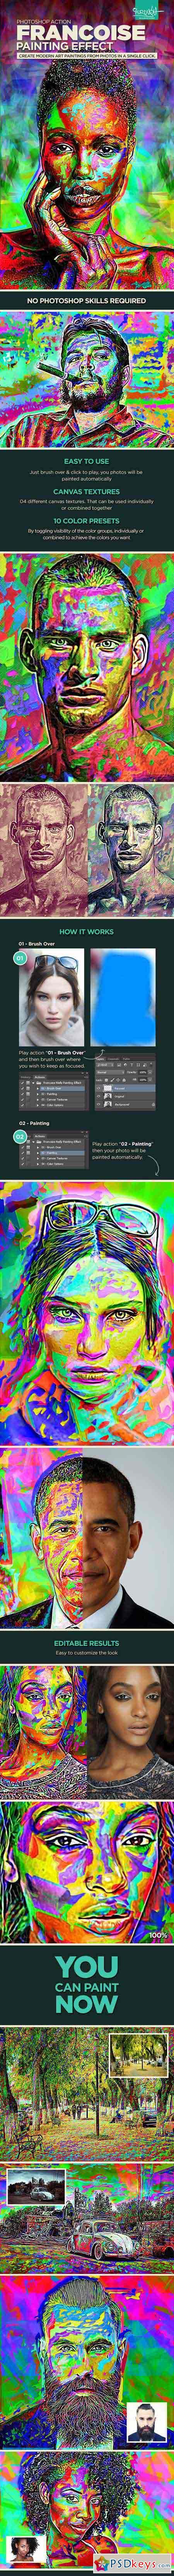 Francoise Painting Effect 12819161